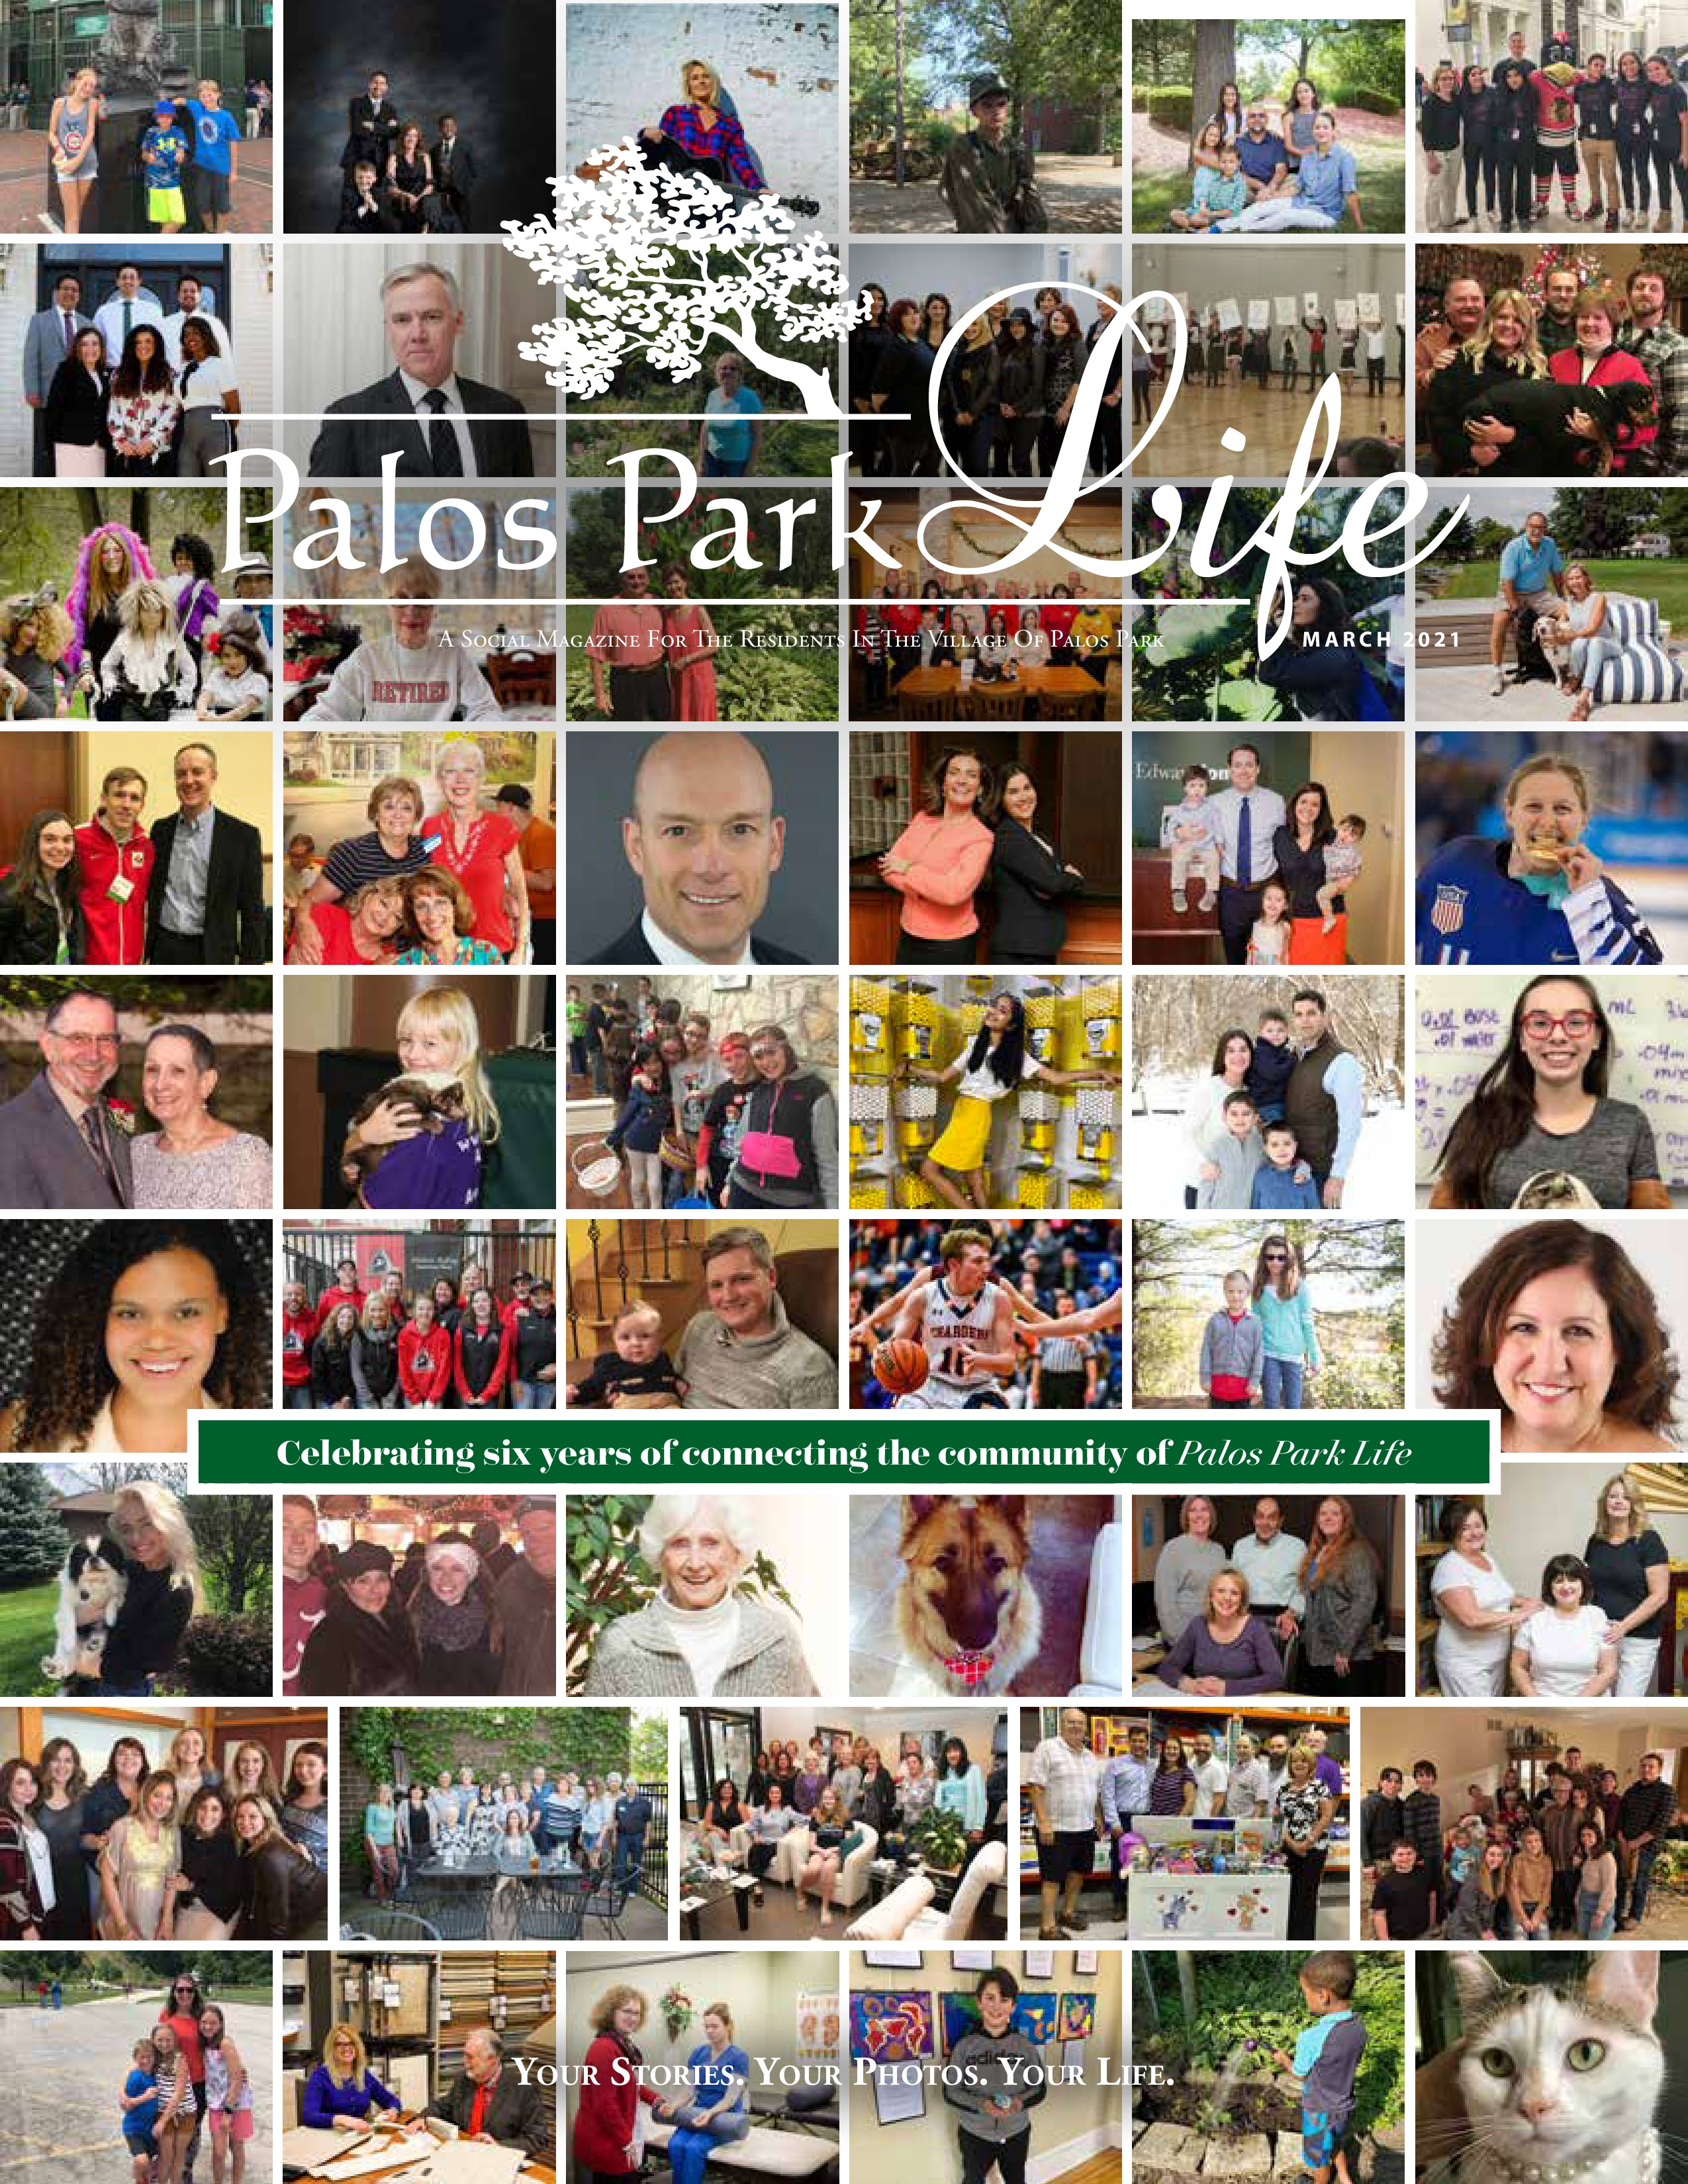 Palos Park Life 2021-03-01